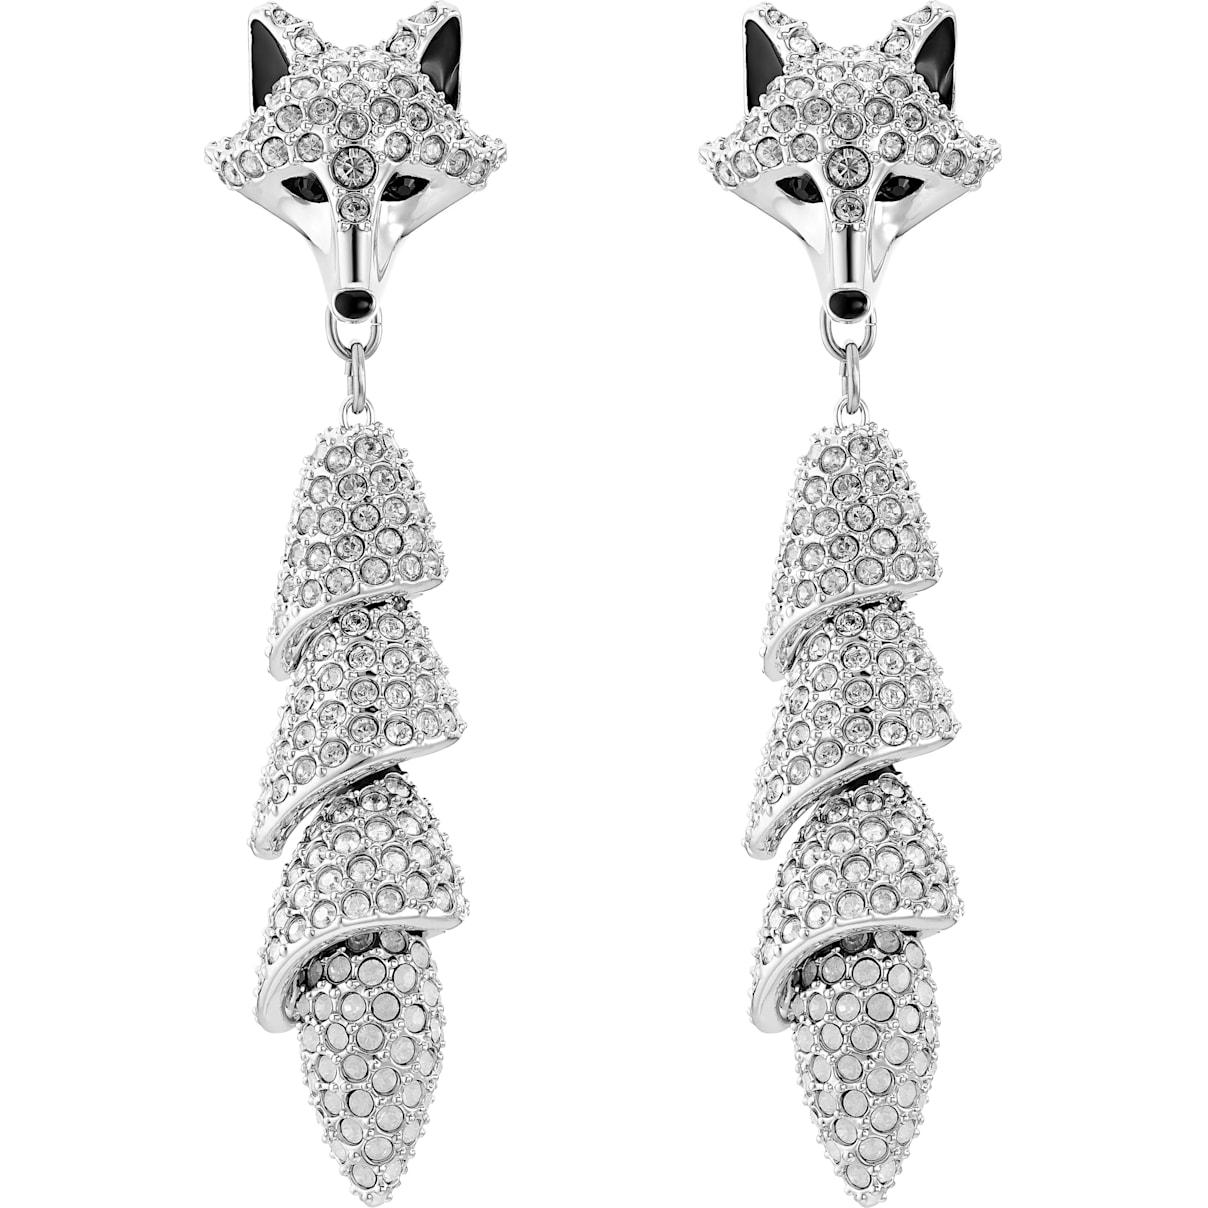 Swarovski Polar Bestiary Drop Pierced Earrings, Multi-colored, Rhodium plated